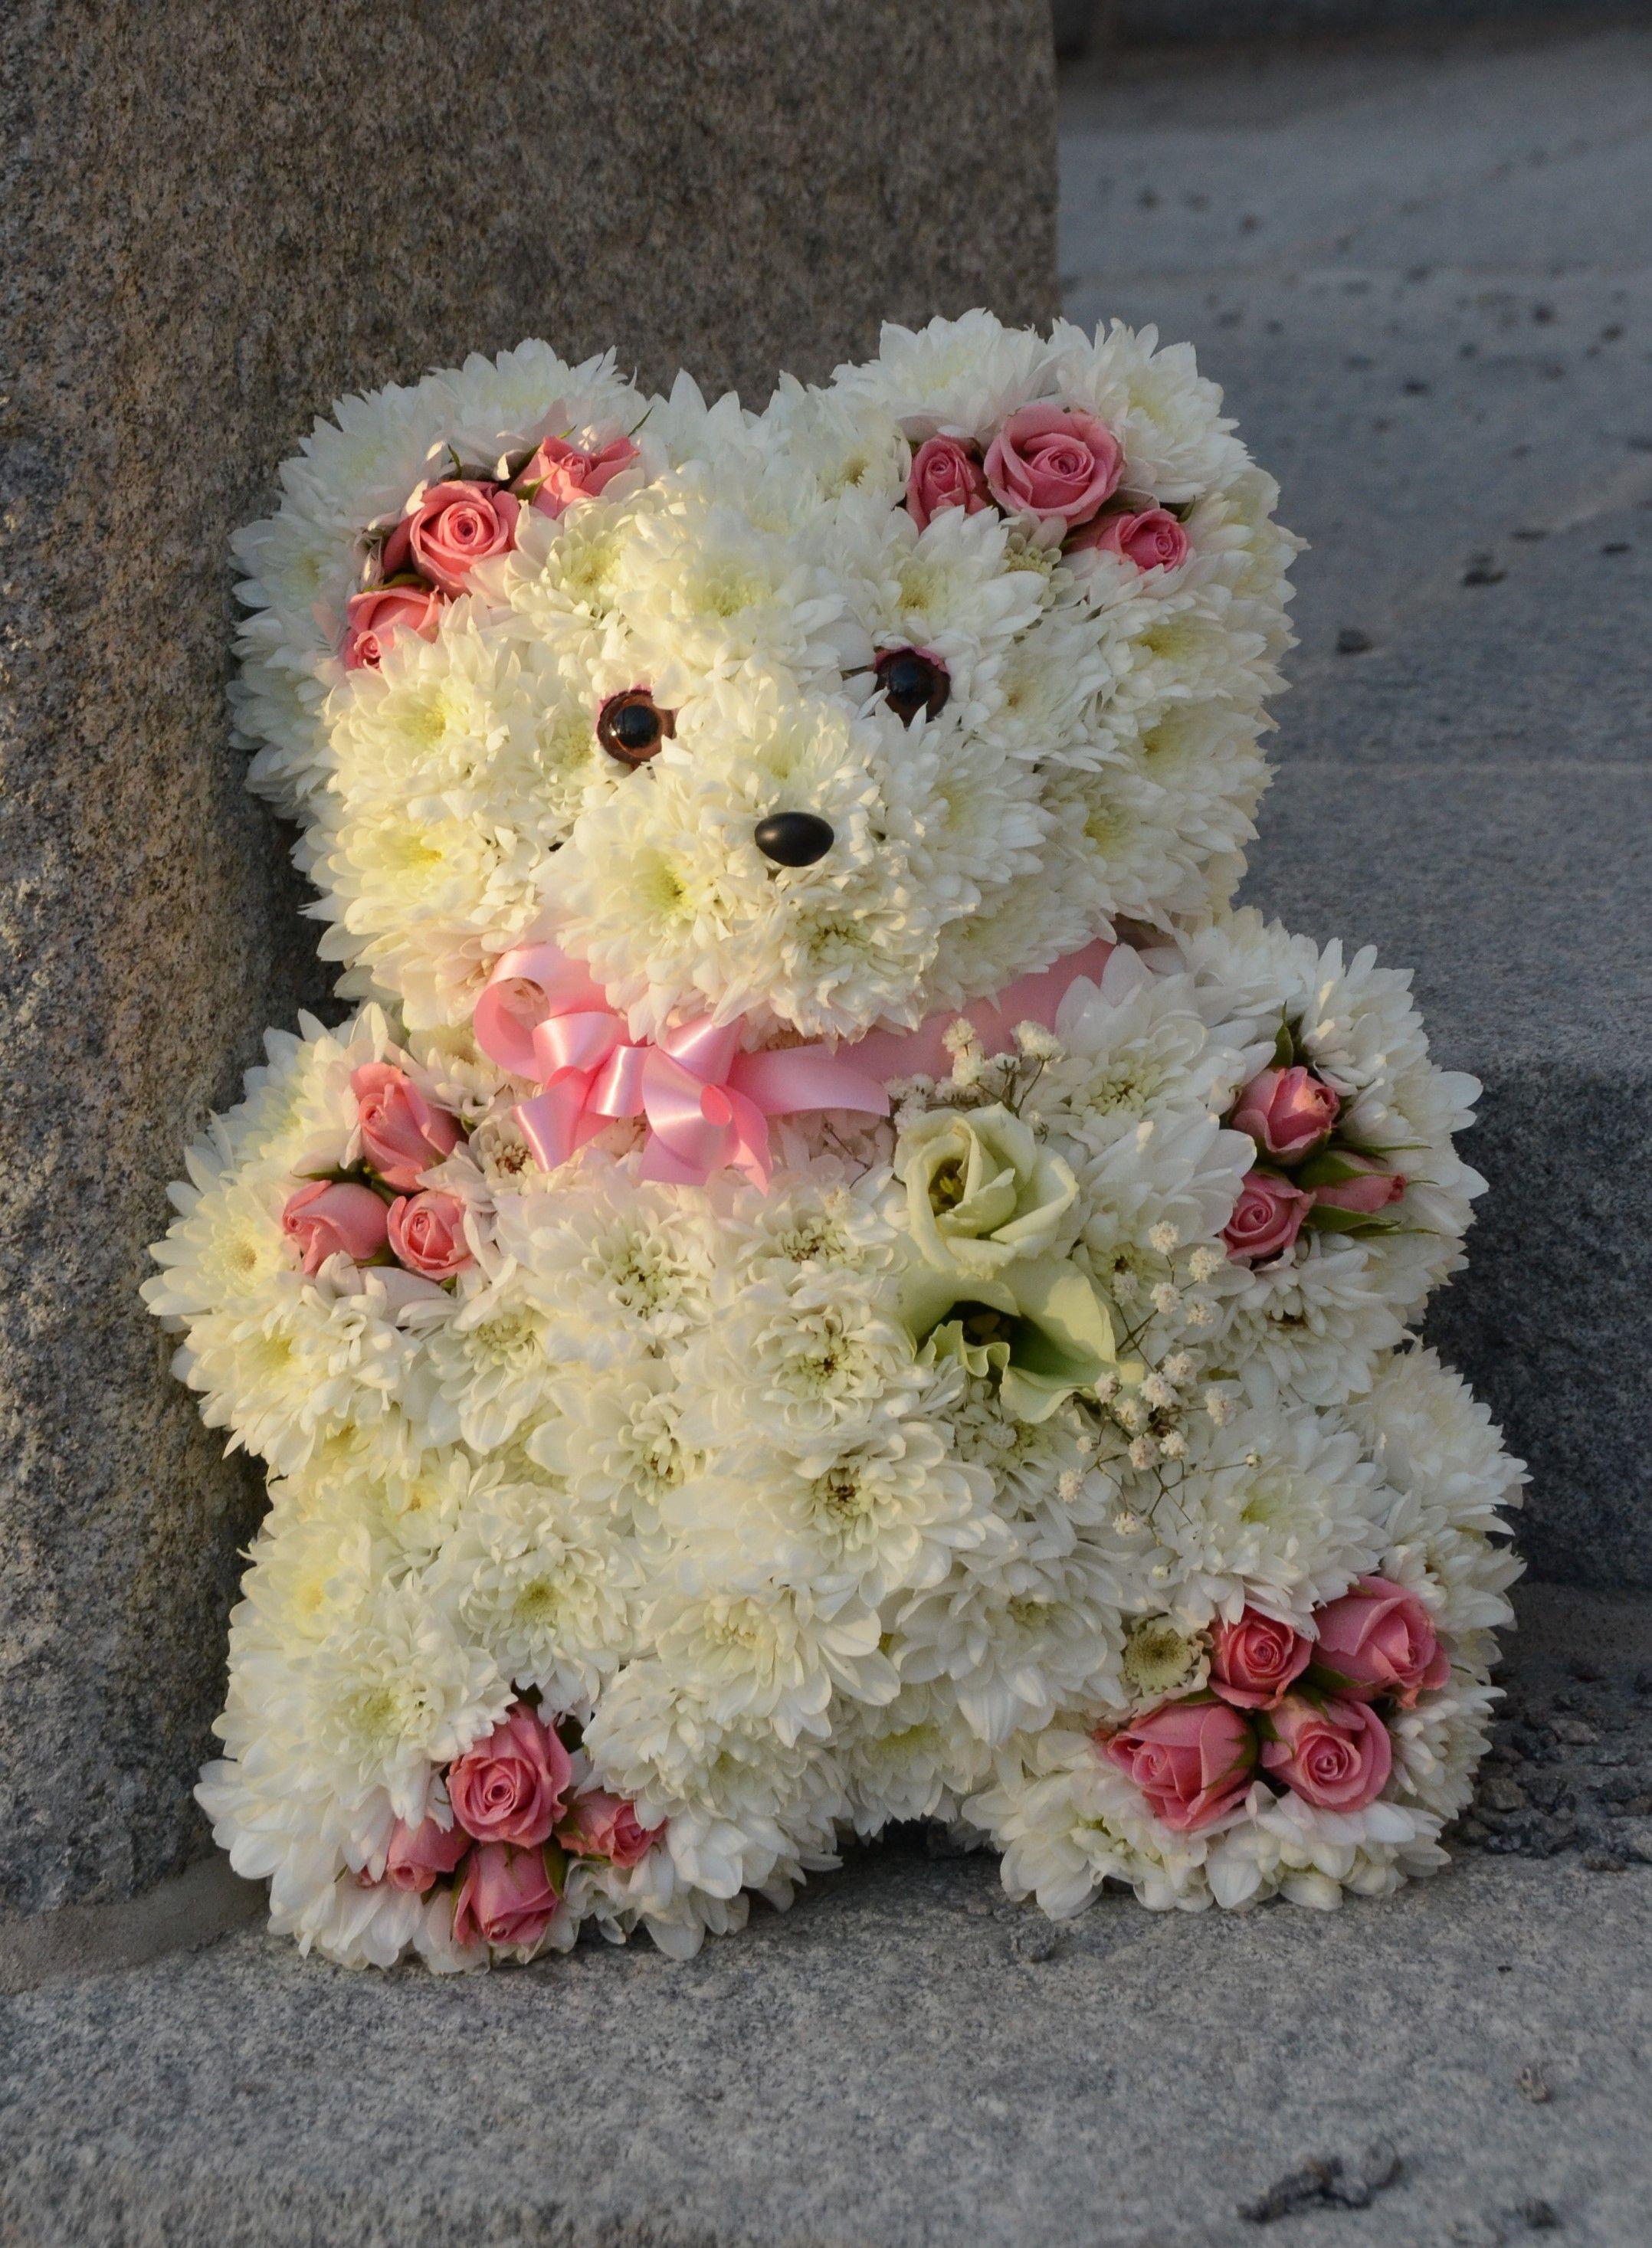 Mini teddy sympathy and funeral floral design using oasis foam mini teddy sympathy and funeral floral design using oasis foam frames mini shapes oasisfloral izmirmasajfo